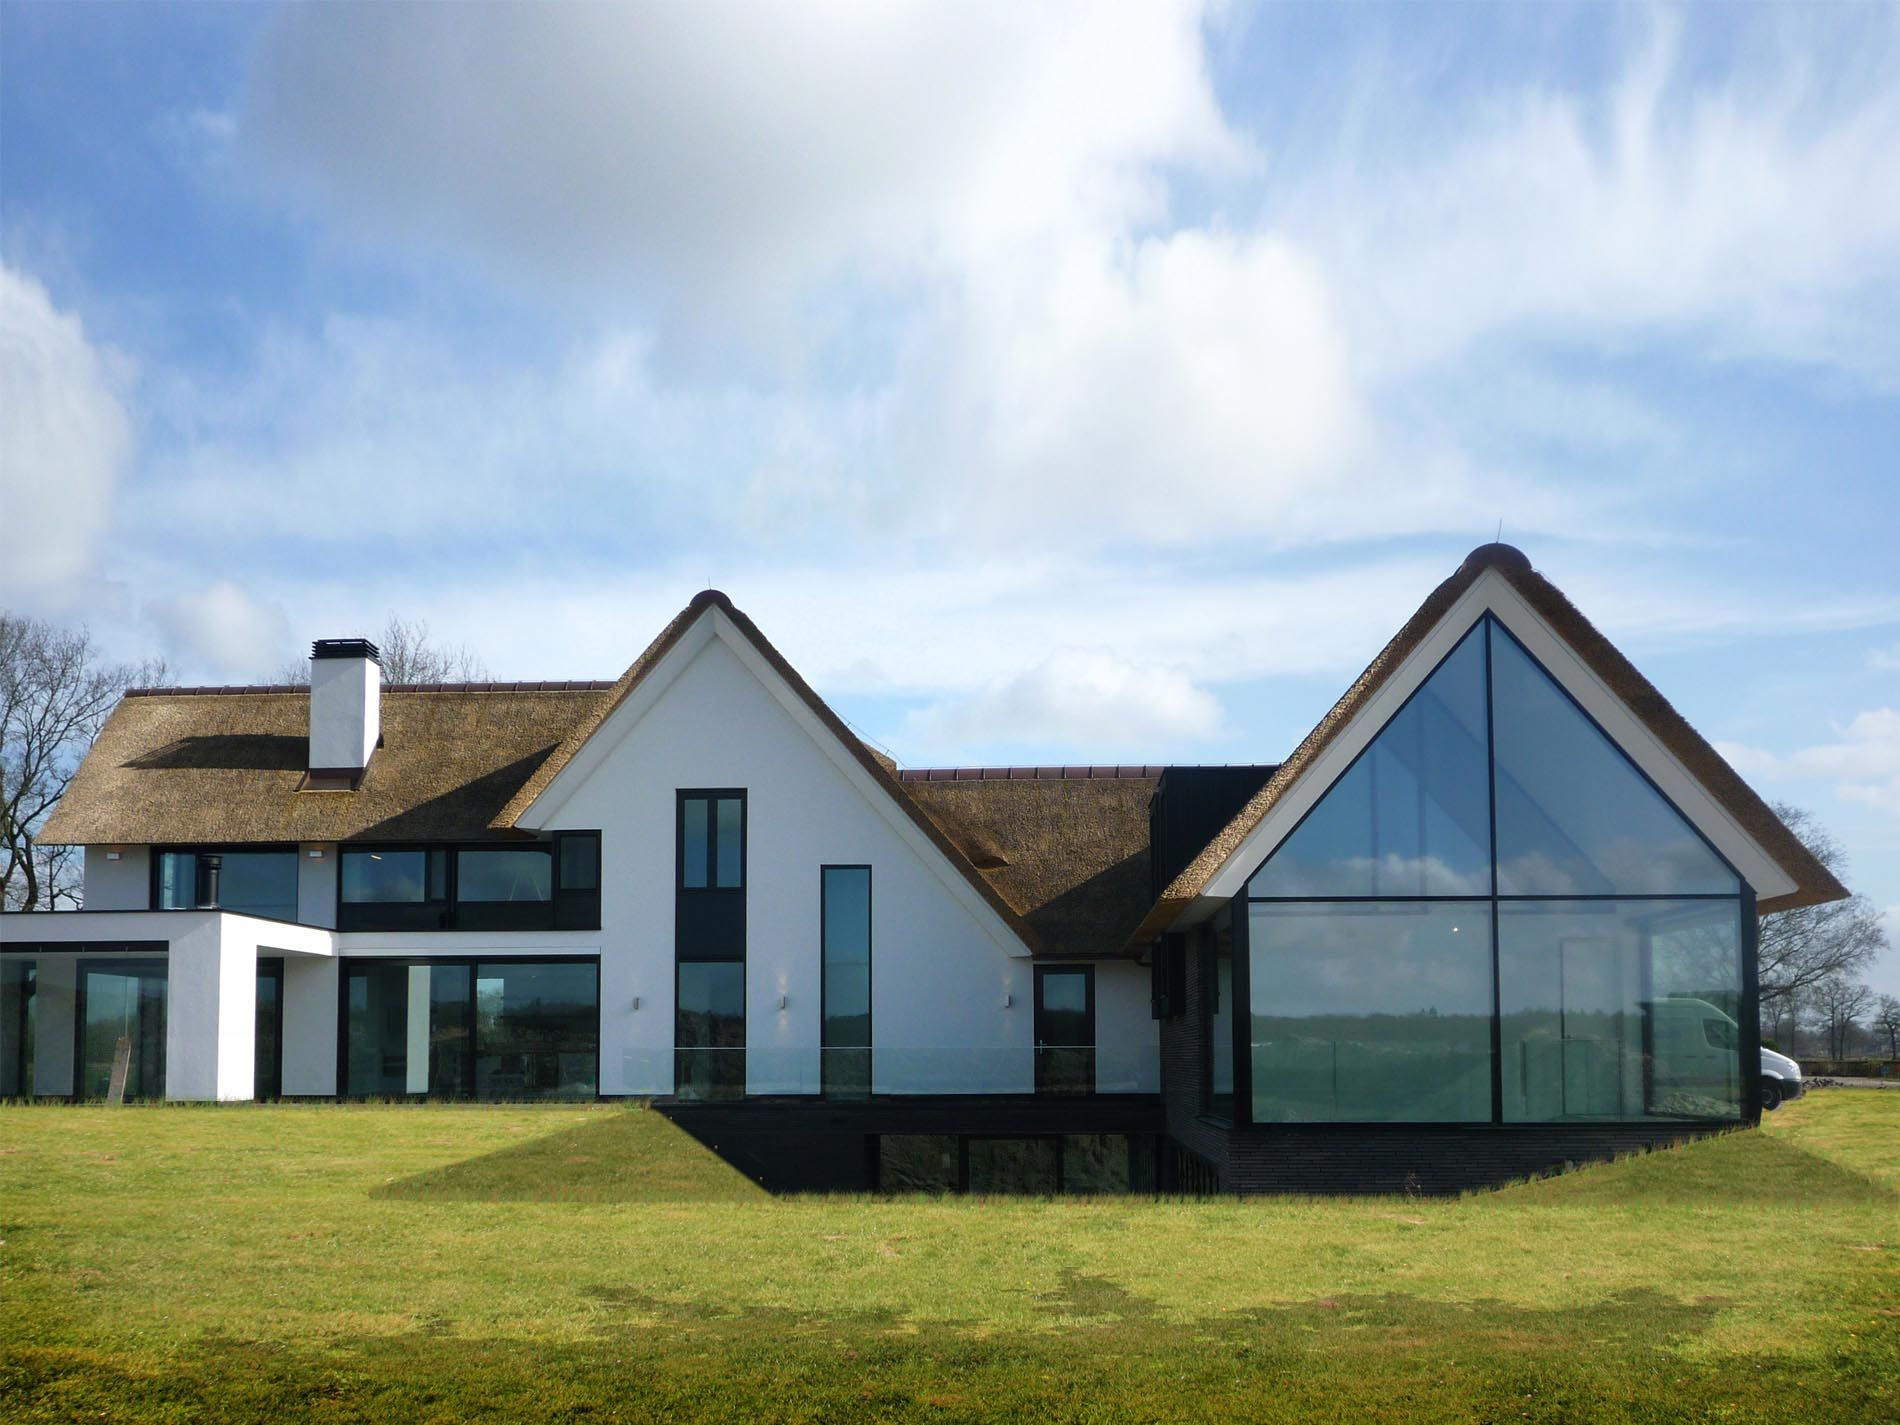 Maas architecten woonhuis raalte stucwerk modern for Moderne villa architectuur